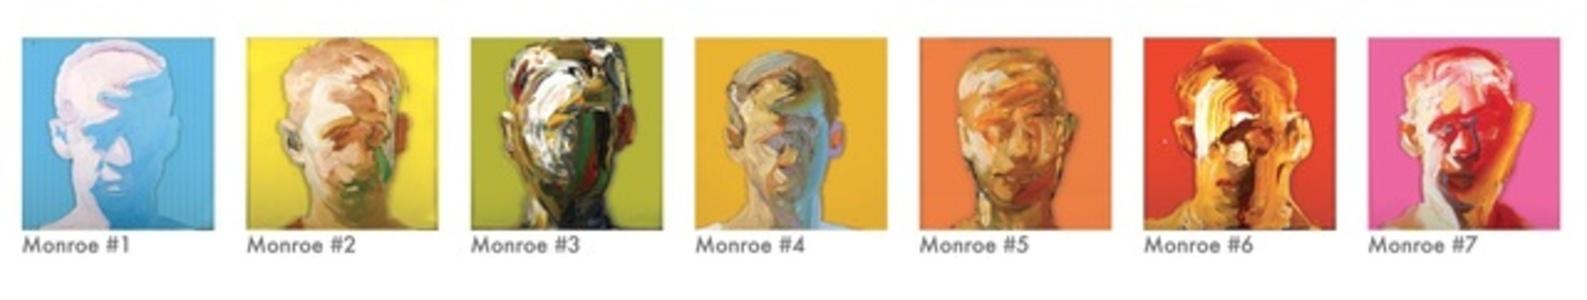 Monroe Series